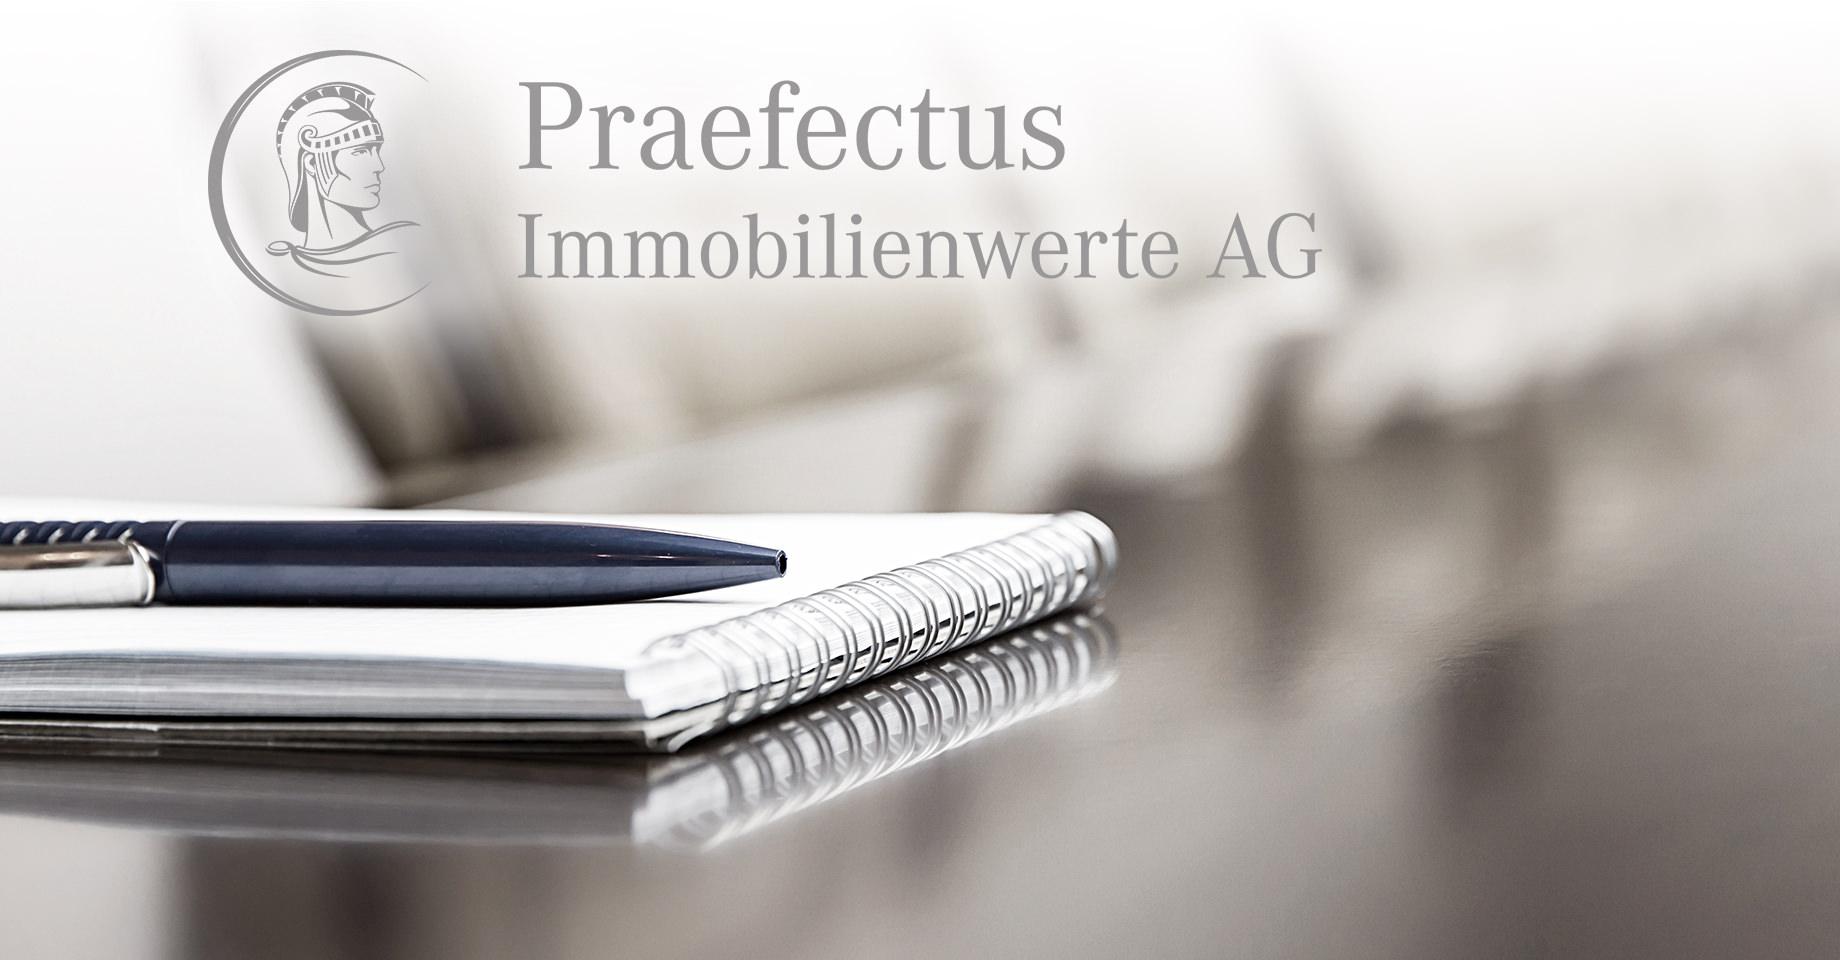 Praefectus Logo und Imagebild